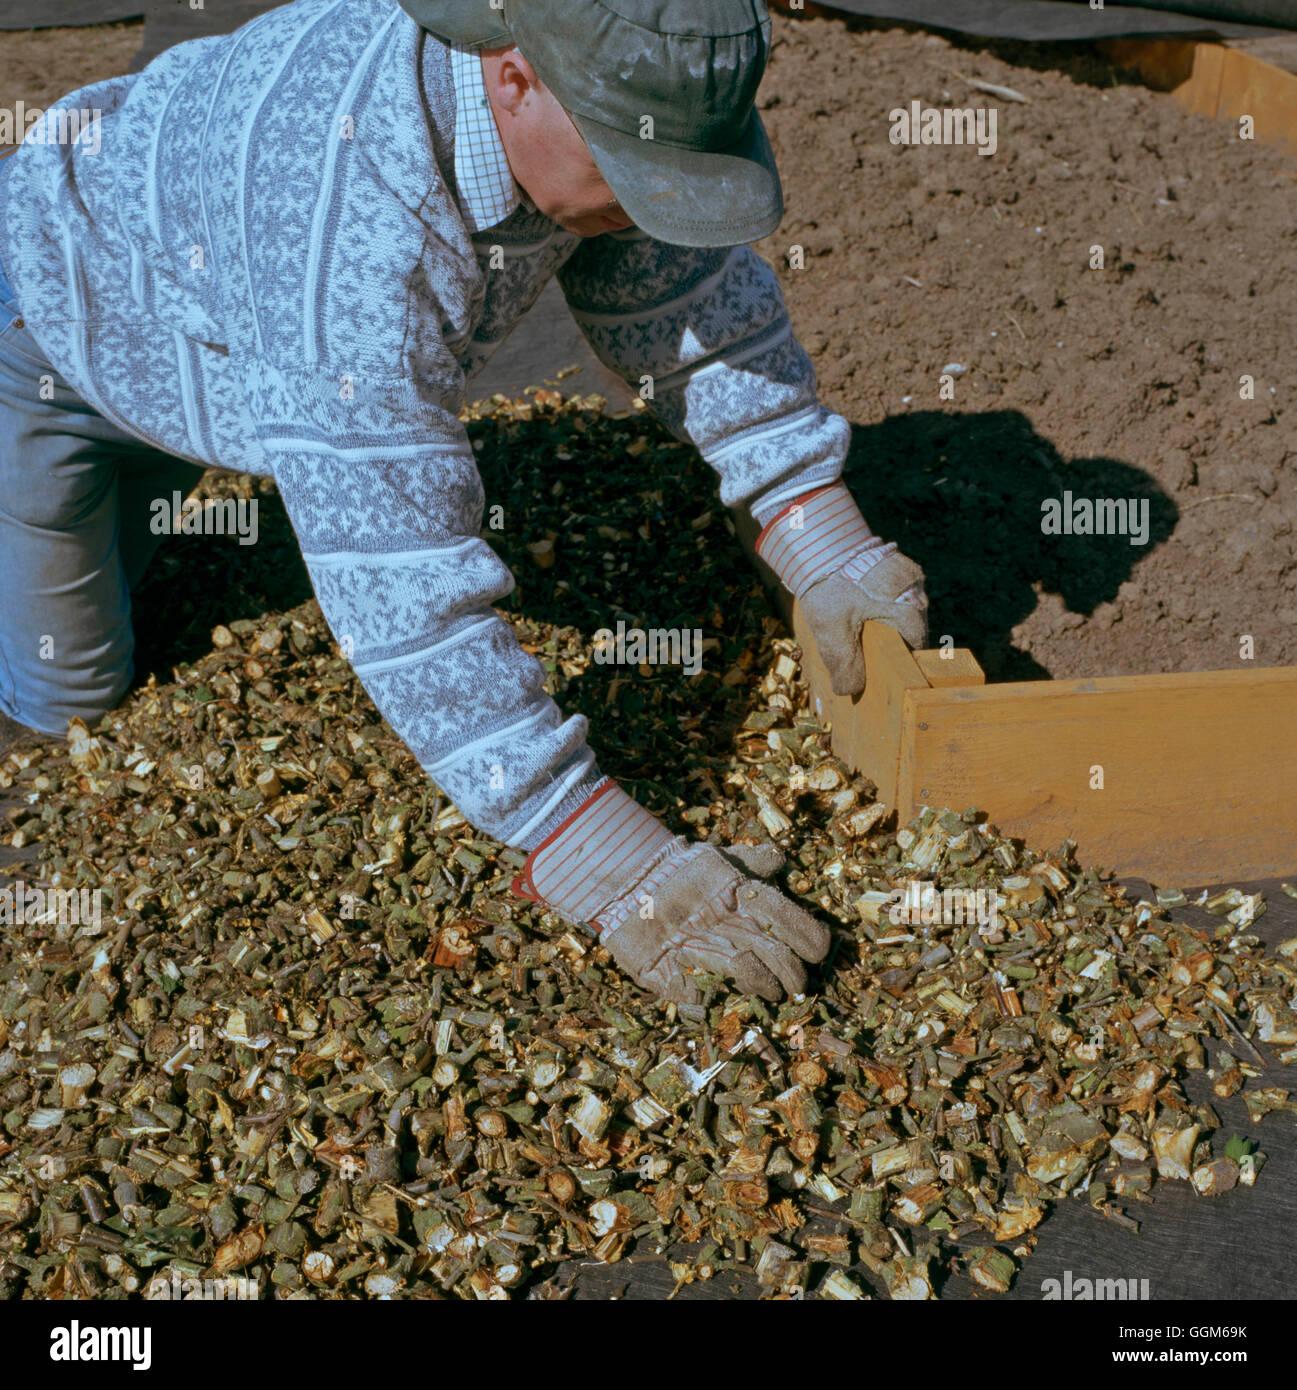 Weed Block Stock Photos & Weed Block Stock Images - Alamy